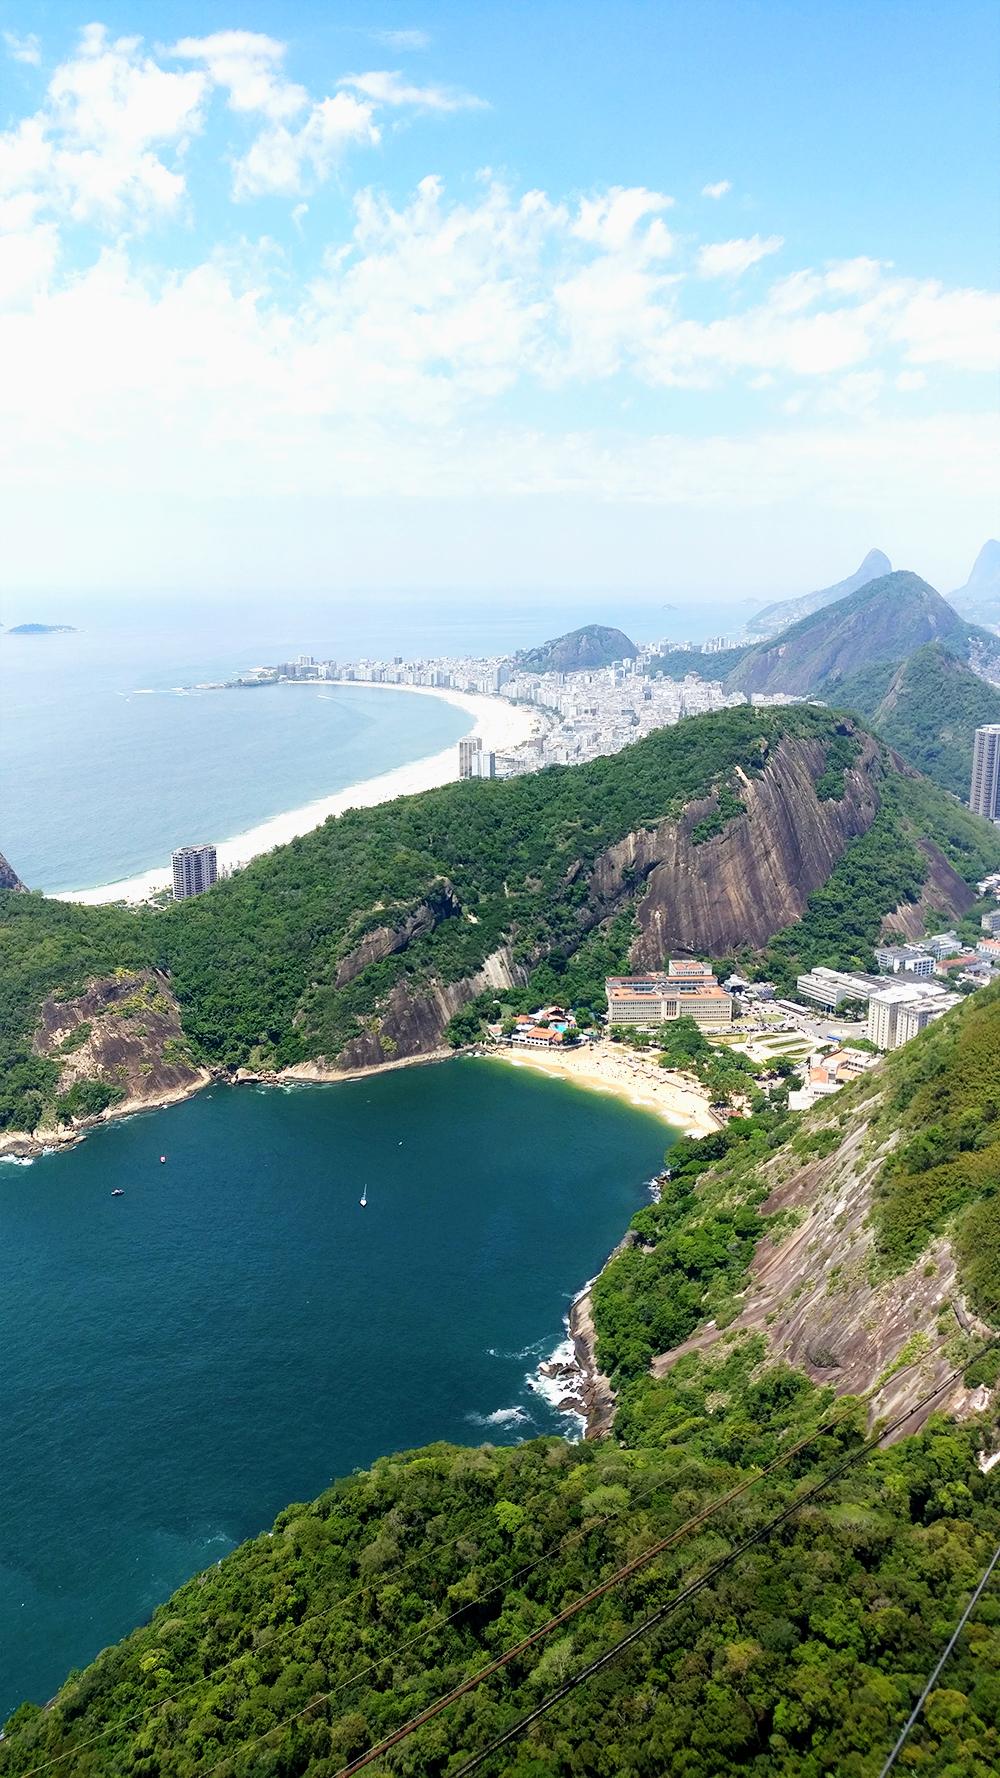 Praia Vermelha and Praia Copacabana from the Sugarloaf mountain - Best beaches in Rio de Janeiro | Aliz's Wonderland